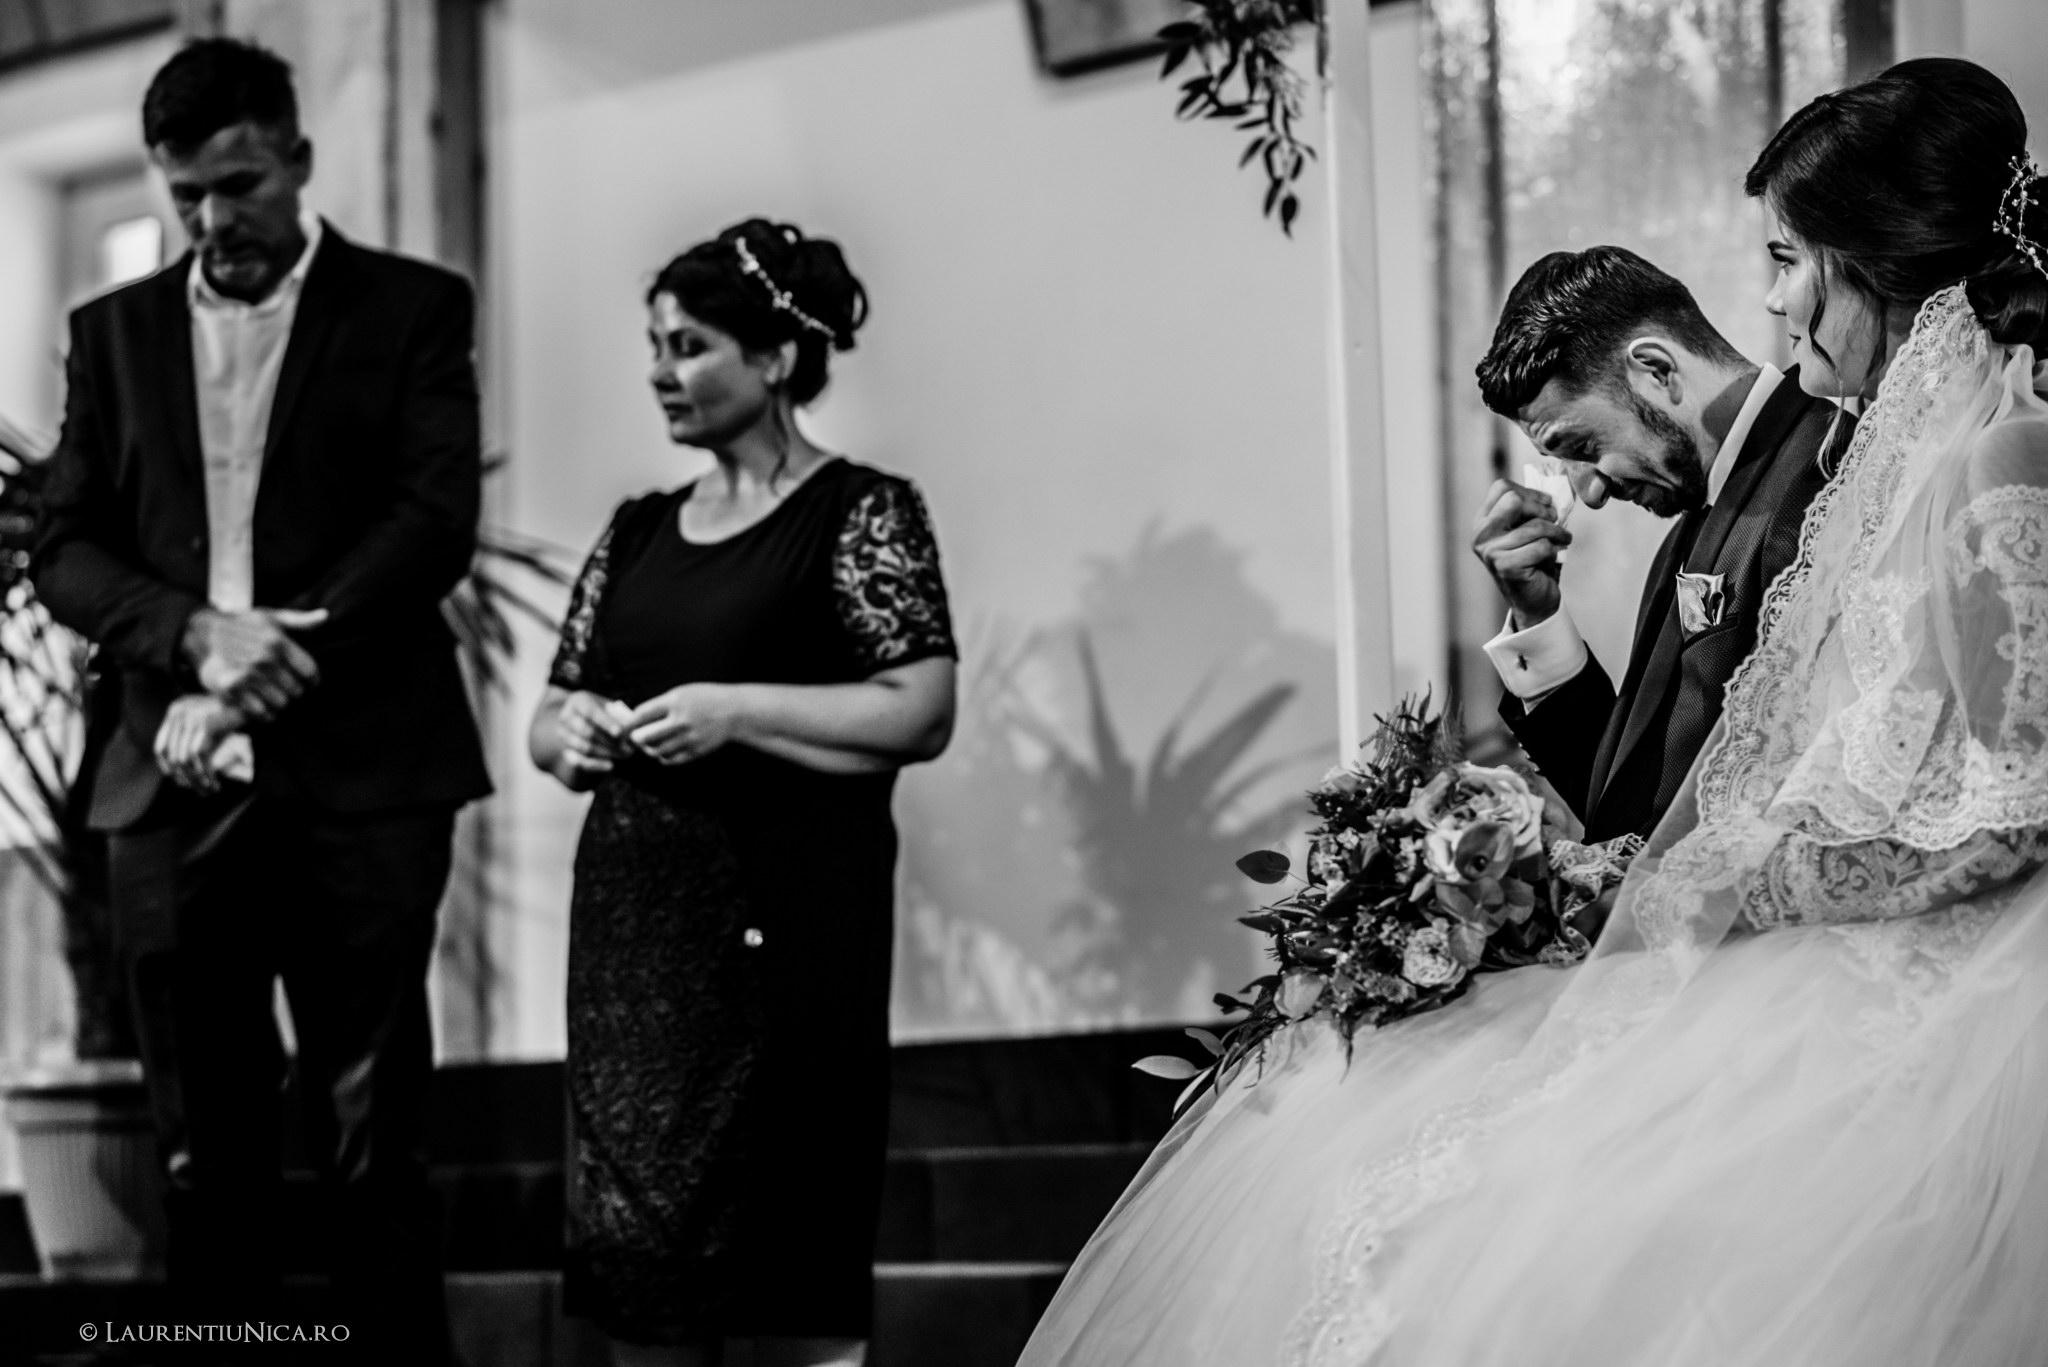 Alina si Andrei fotograf nunta laurentiu nica craiova 28 - Alina & Andrei | Fotografii nunta